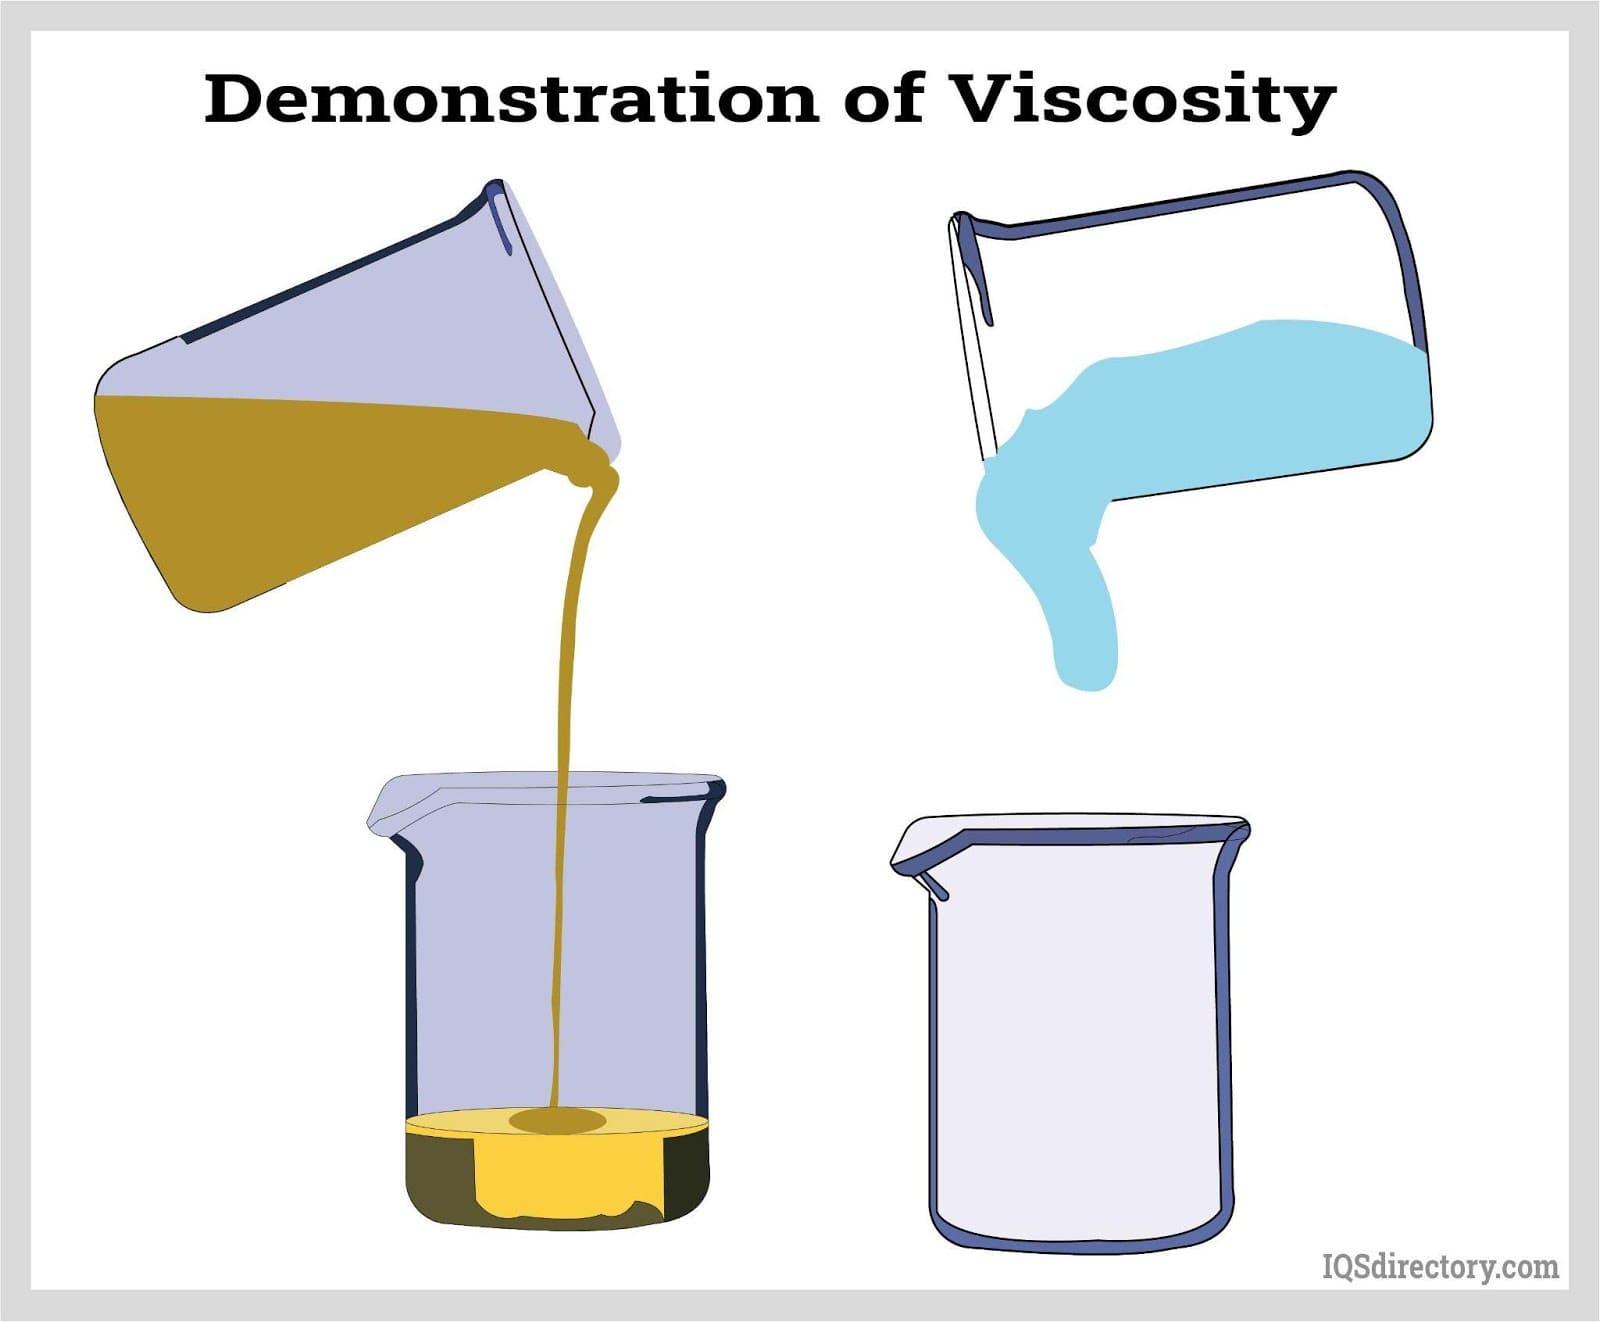 Demo of Viscosity